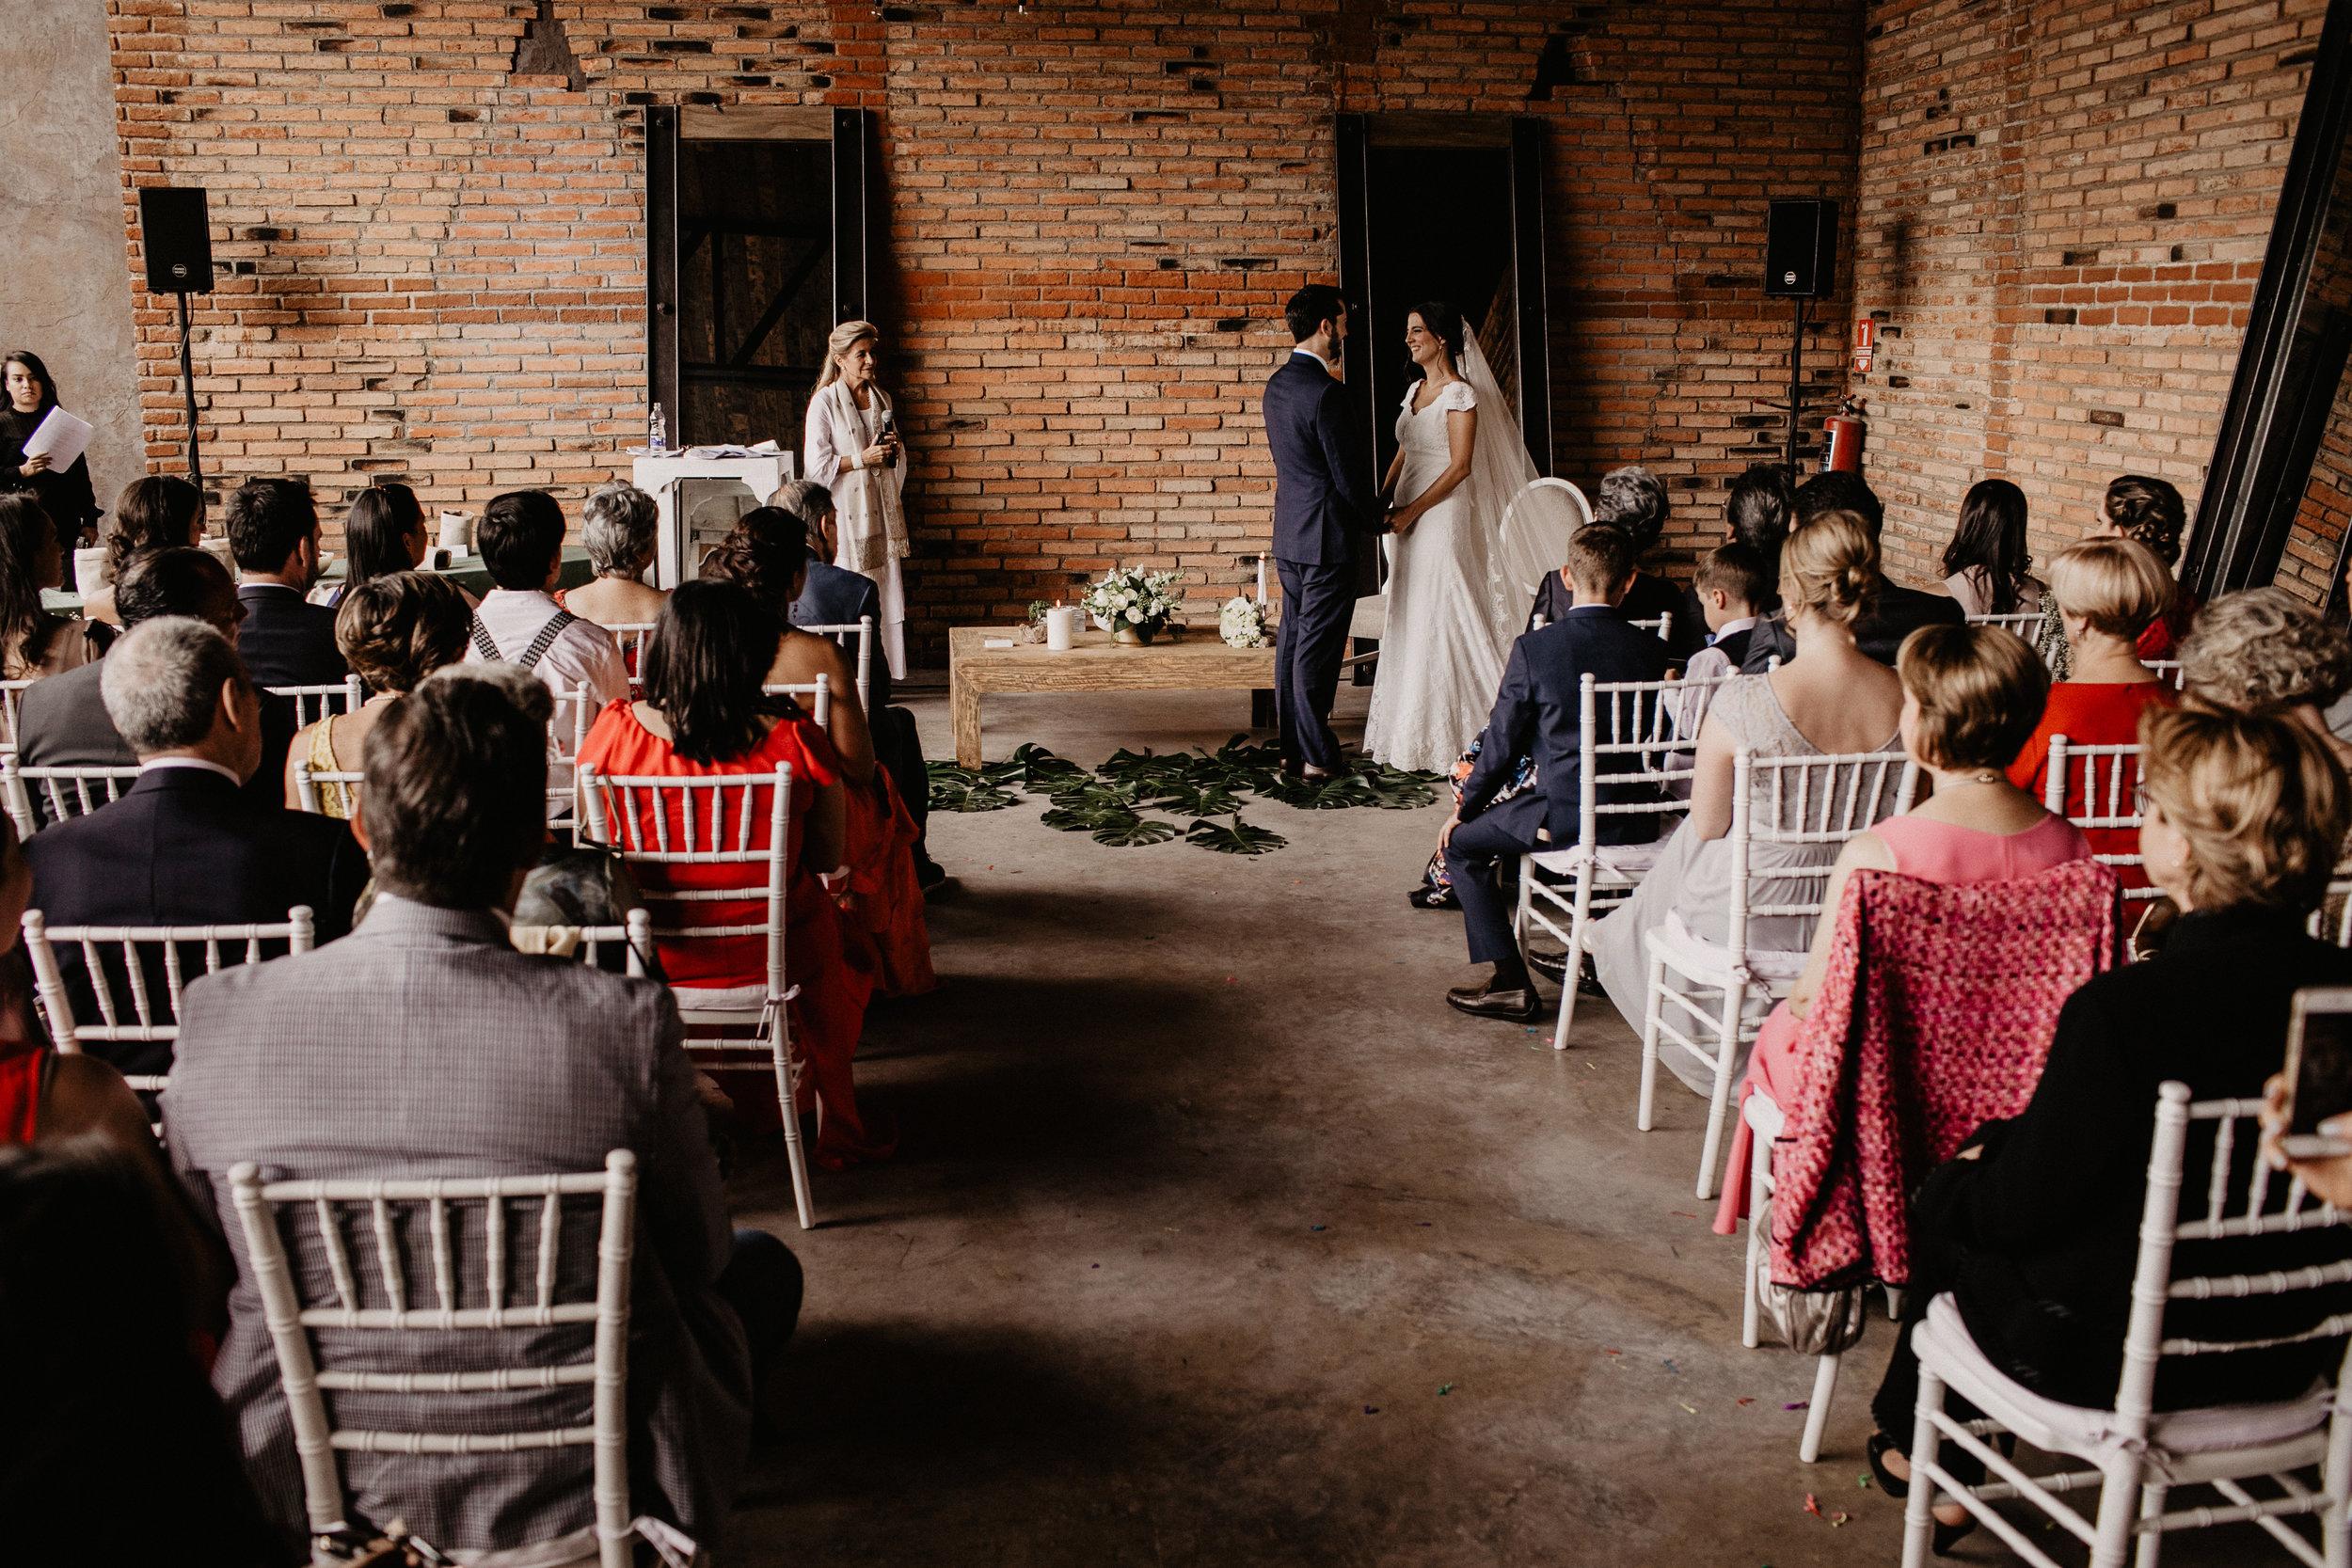 alfonso_flores_destination_wedding_photographer_pau_alonso_629.JPG